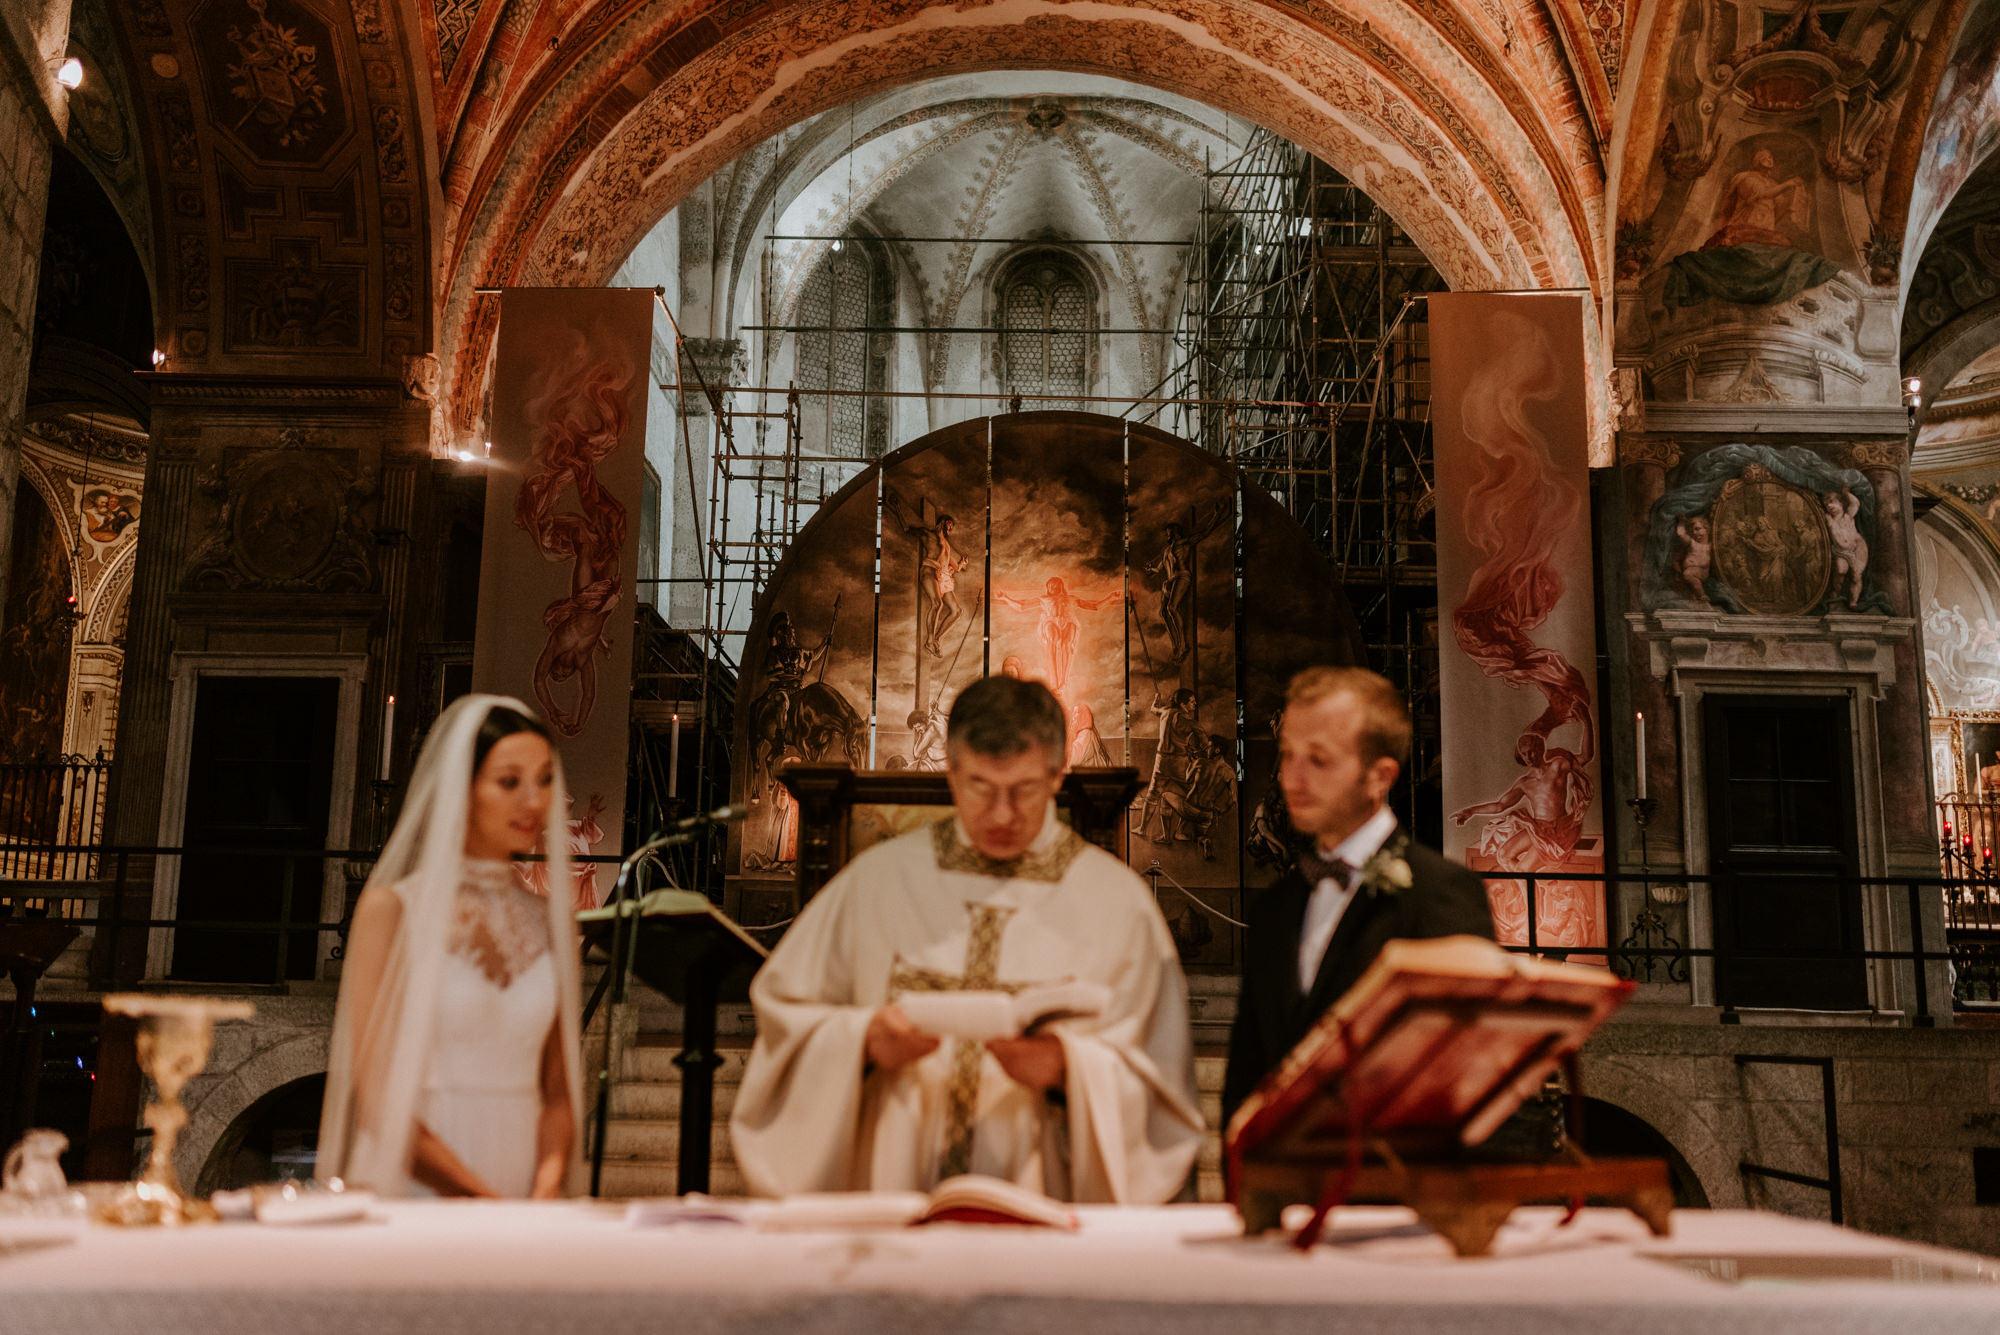 FOTO+PHOTO+BODA+WEDDING+ITALIA+ITALY+MAURICIO+GARAY+MAURICIOGARAY+WEDDINPHOTOGRAPHER+FOTOGRAFODEBODA-871.jpg